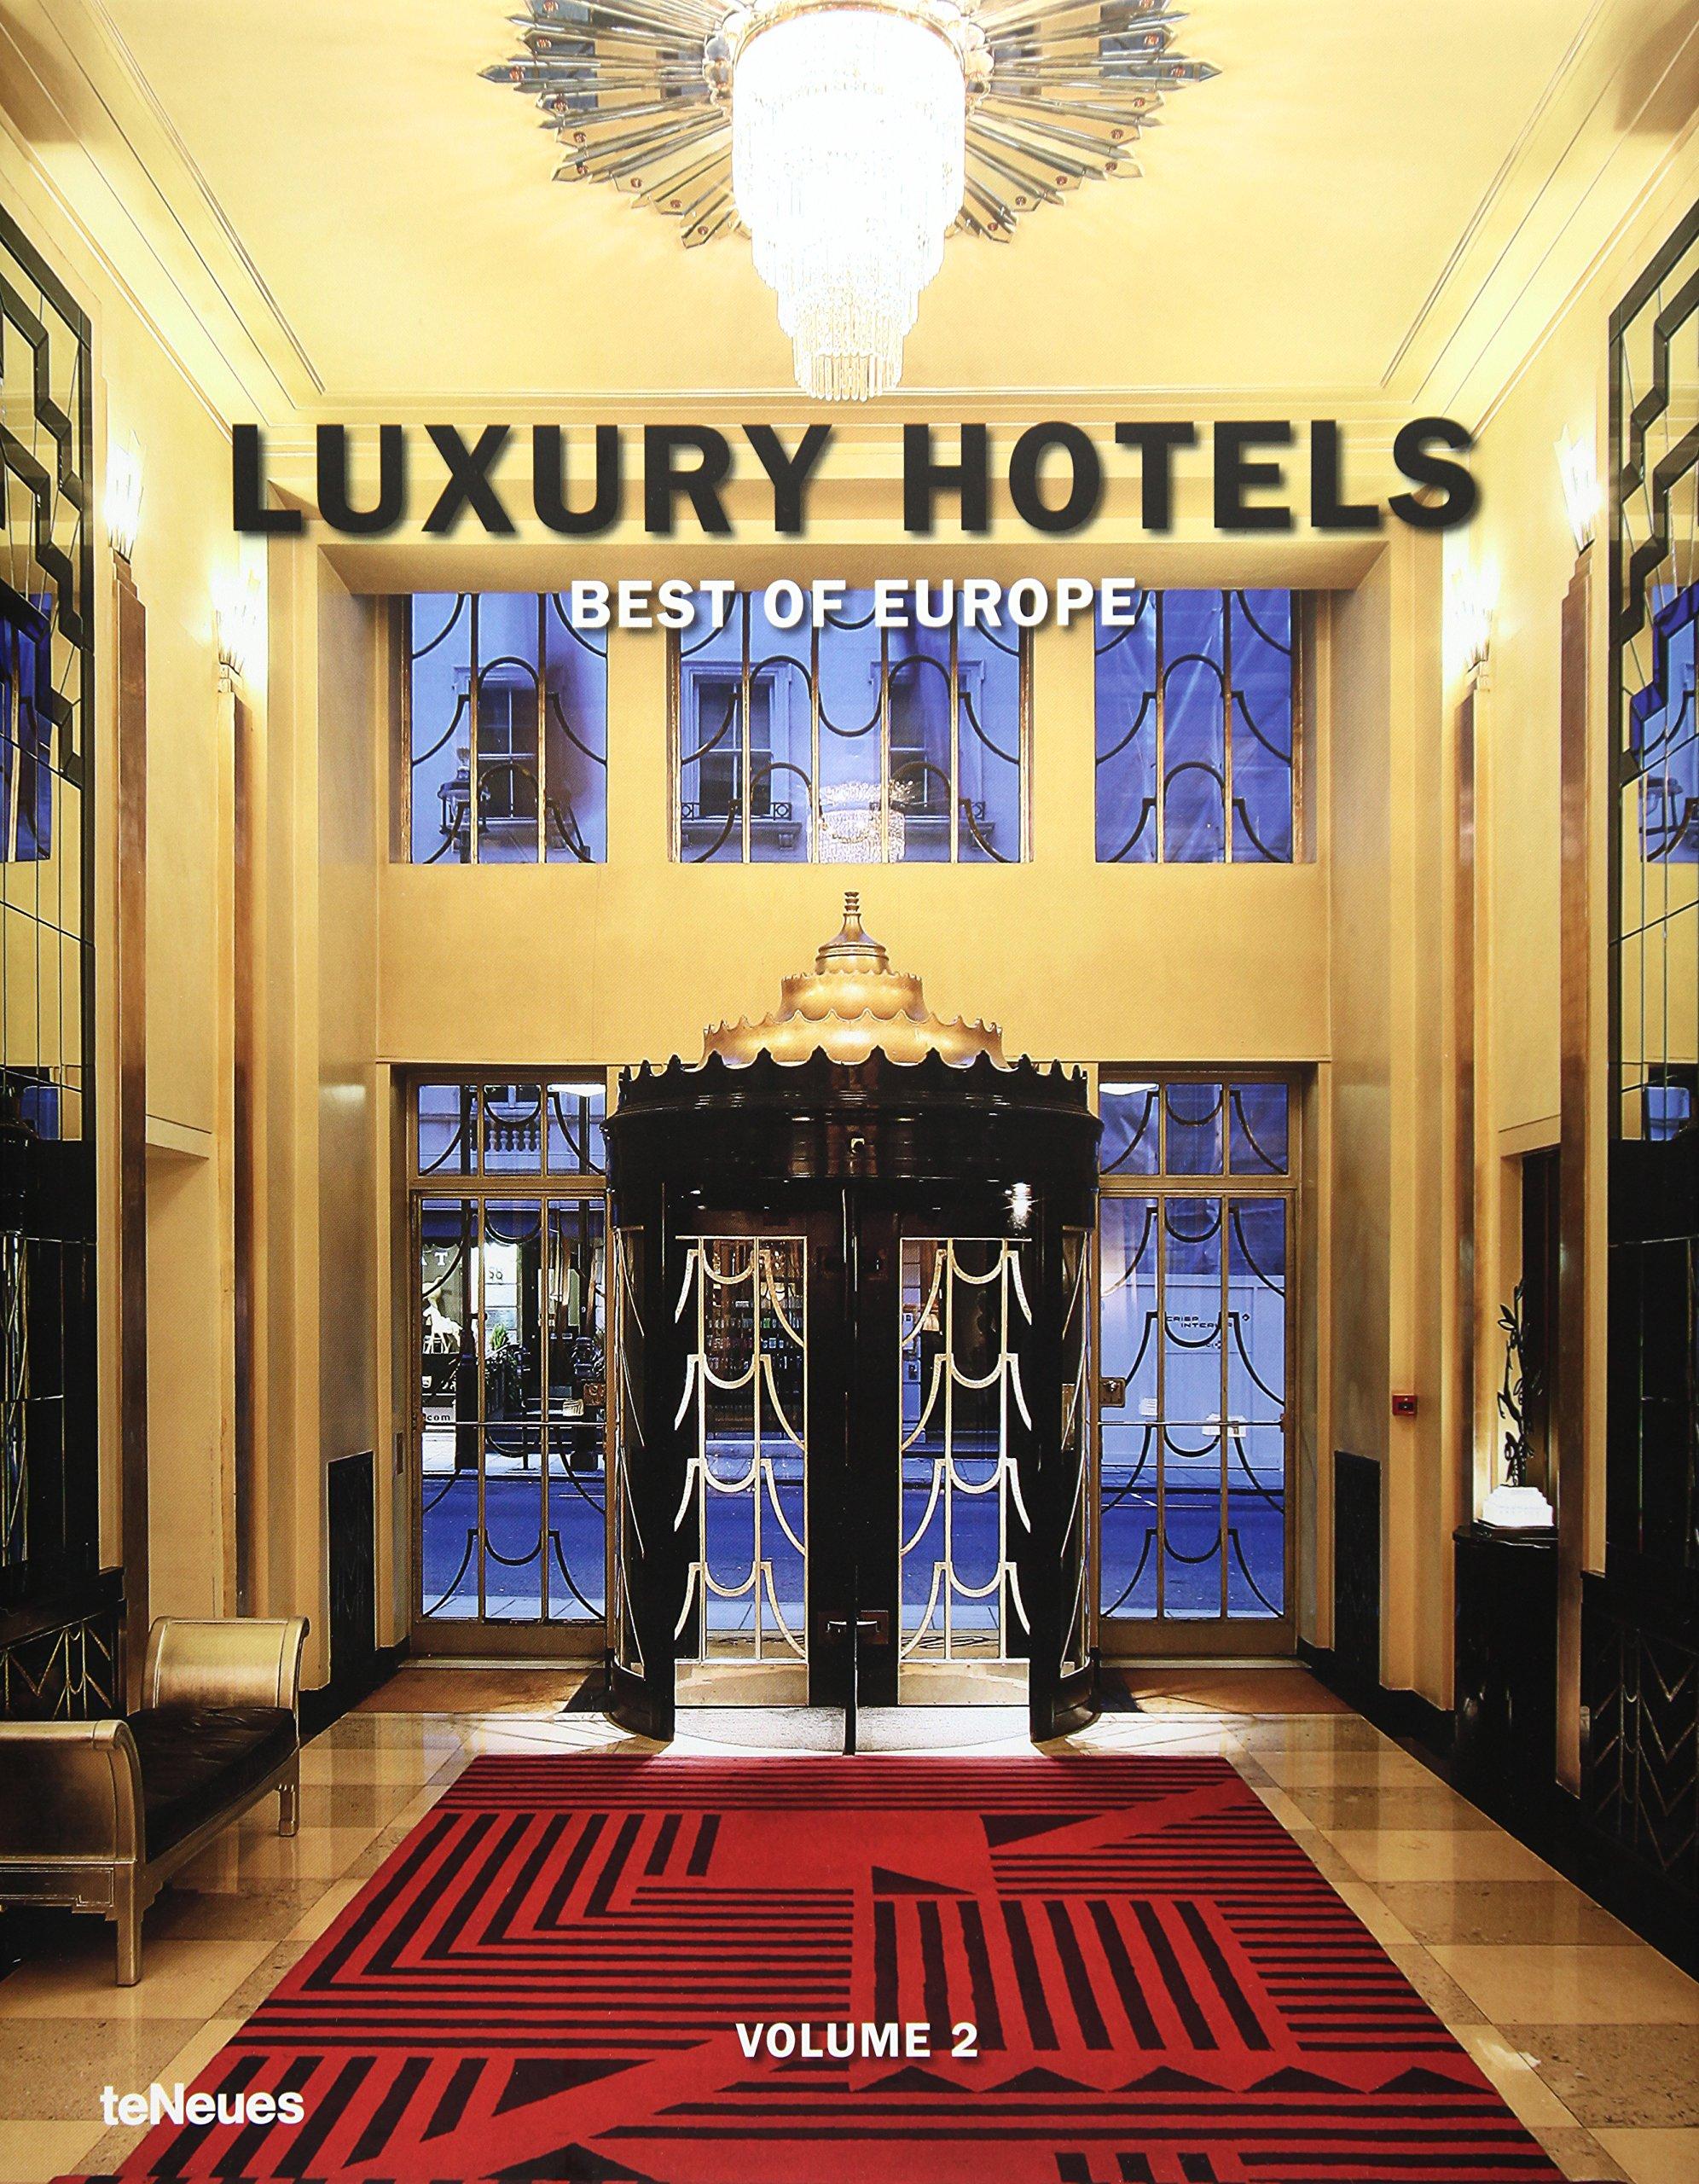 Amazon com luxury hotels best of europe volume 2 9783832796136 martin n kunz books